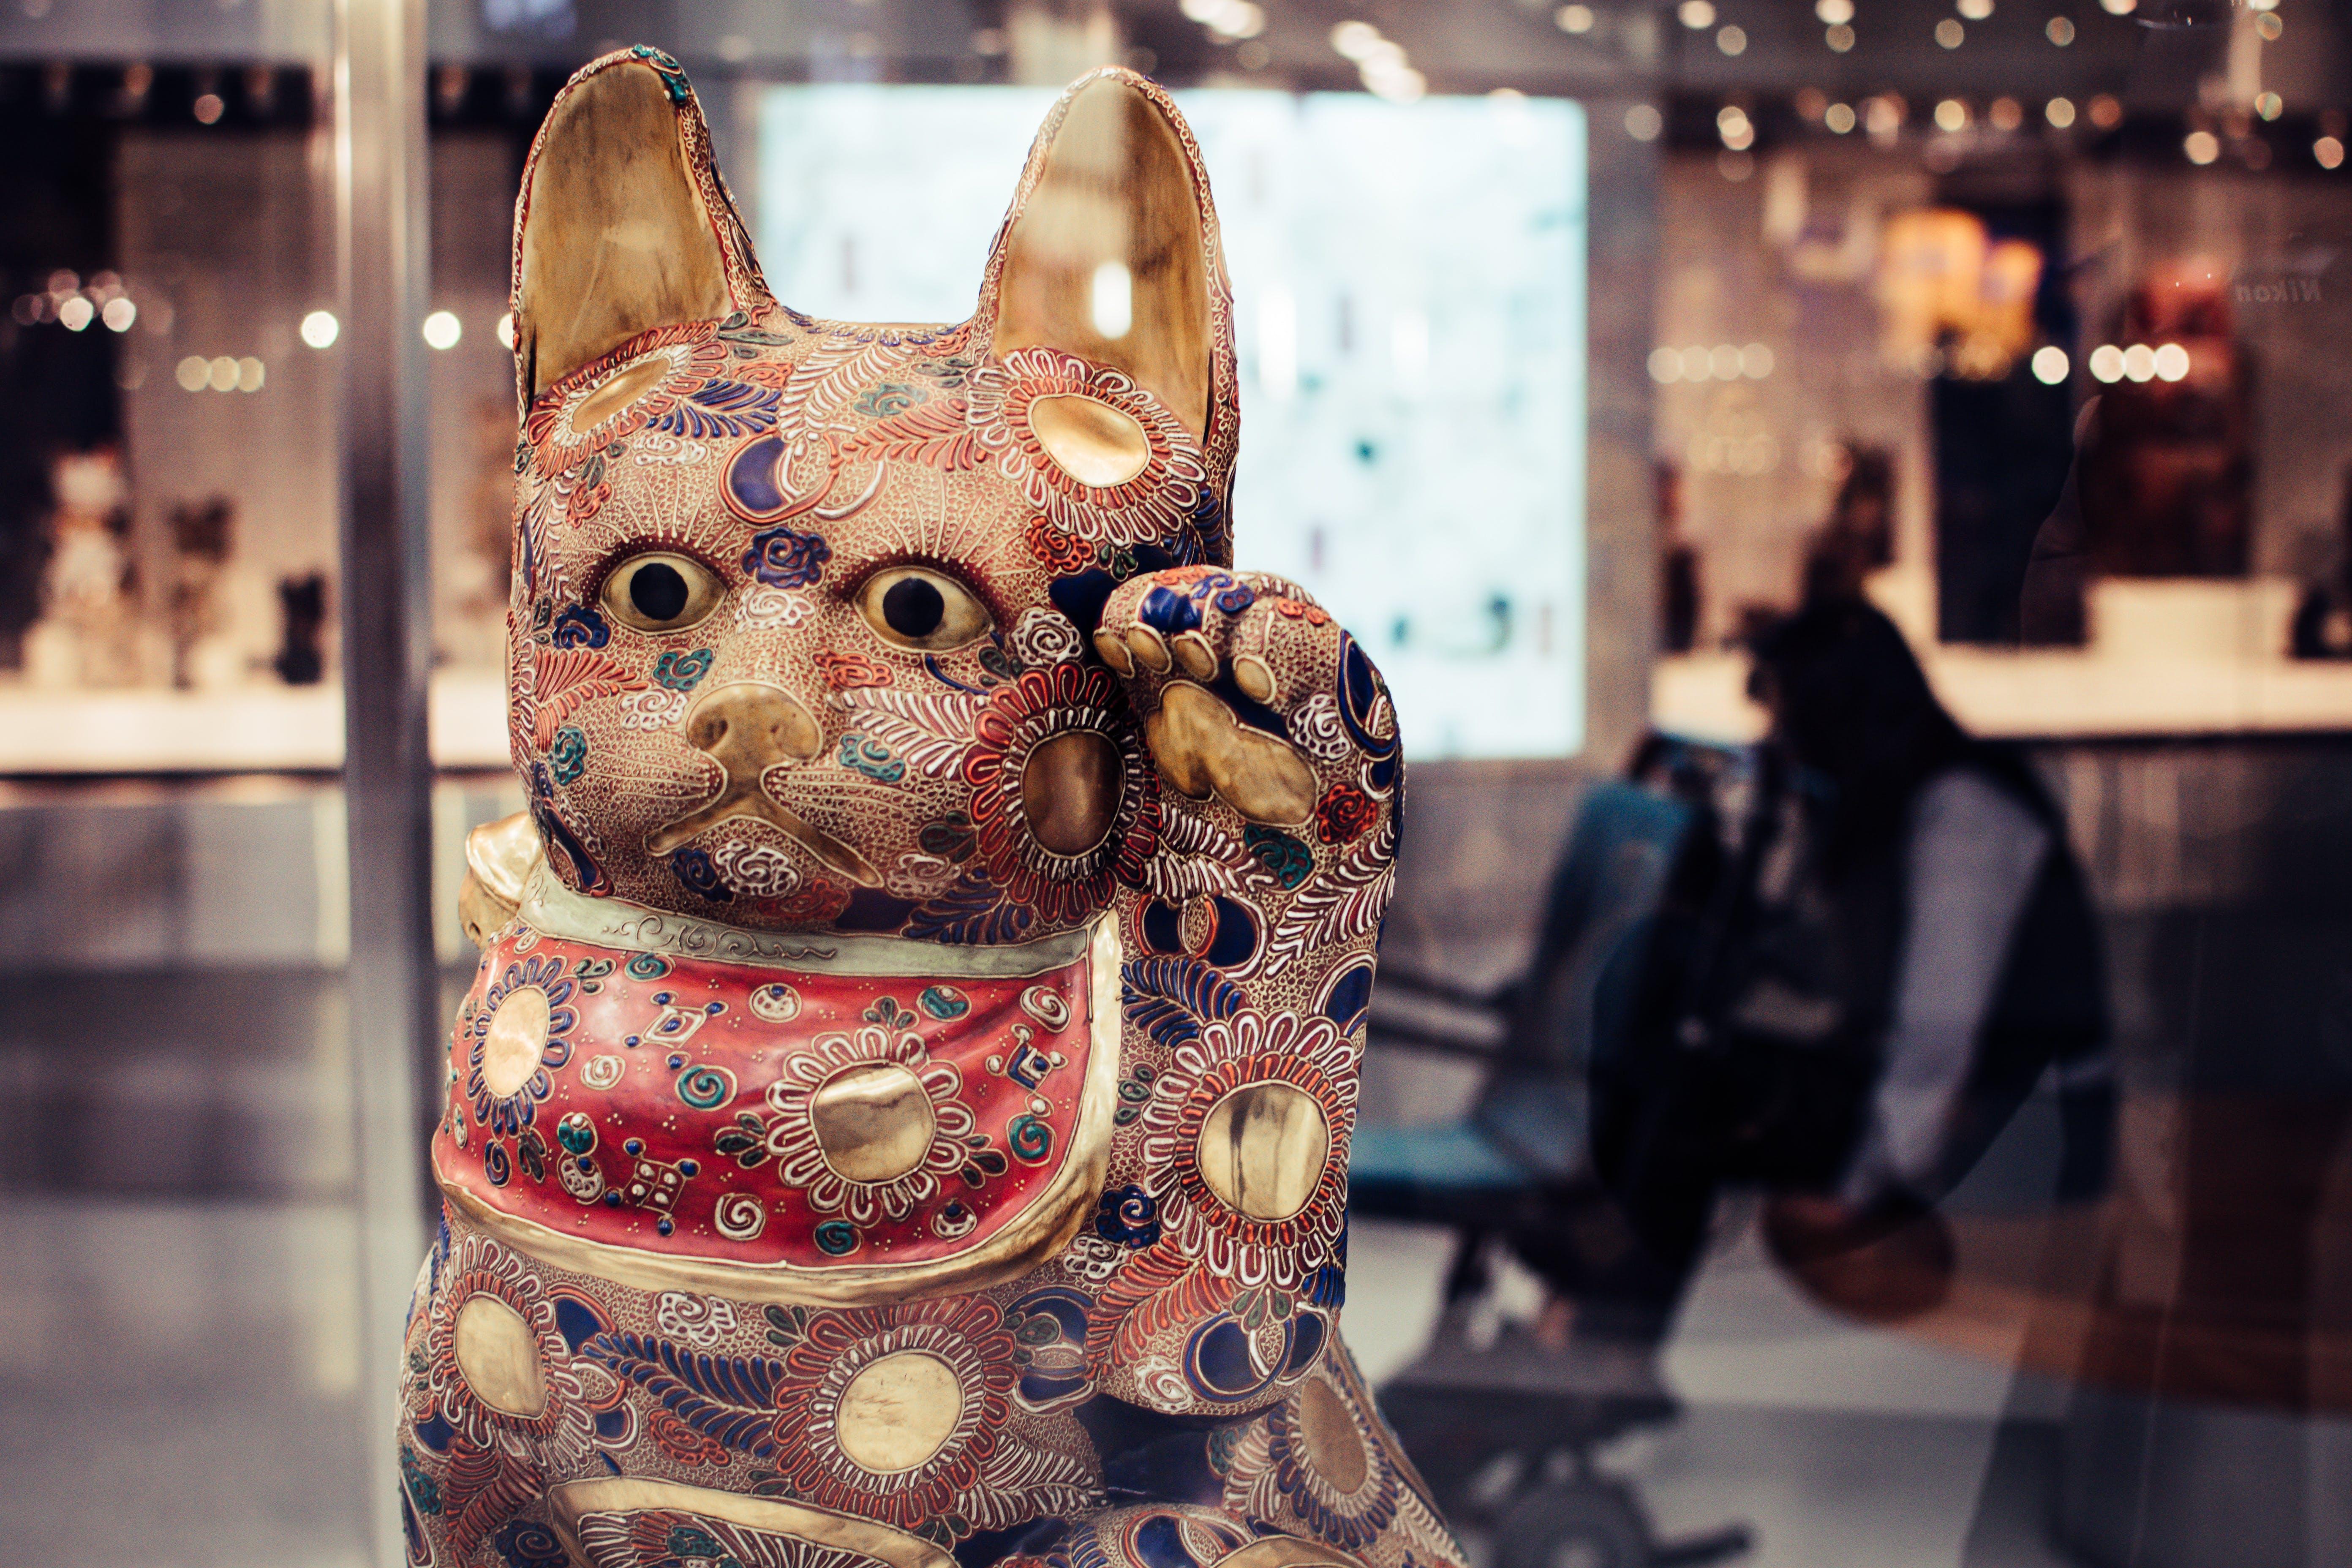 Shallow Focus Photography of Maneki-neko Figurine